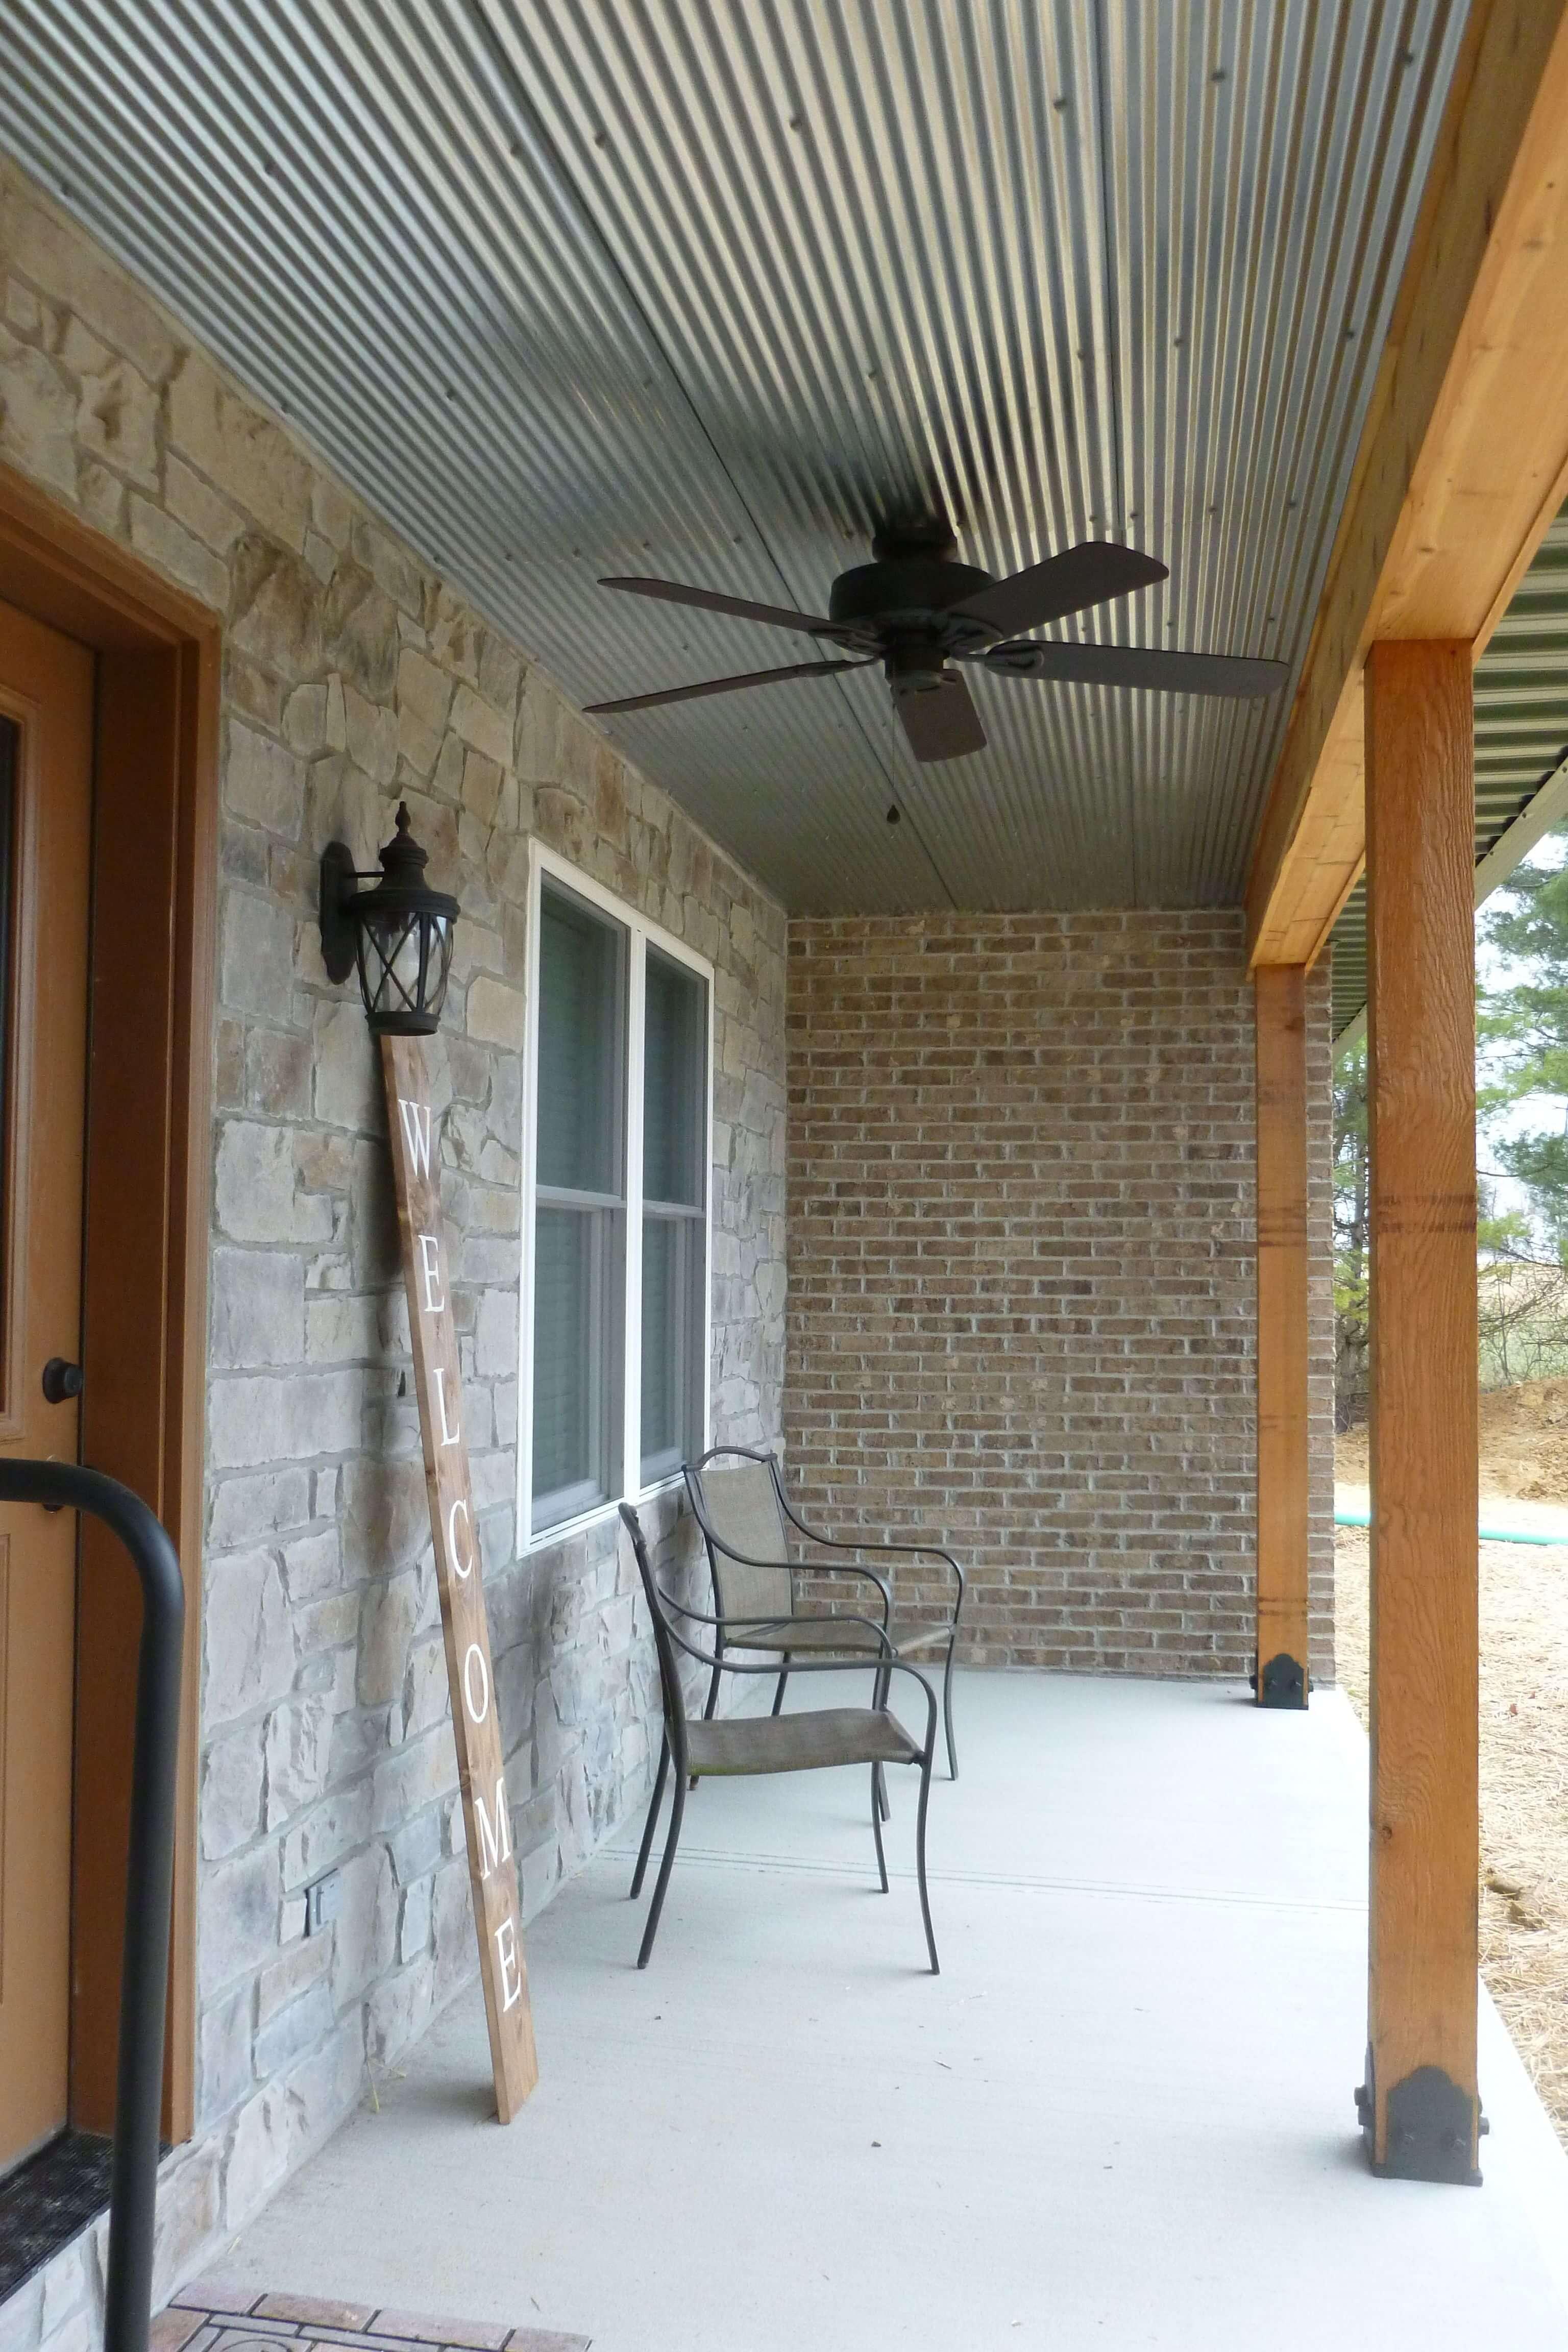 100 Best Ceiling Design Ideas for Porch UK - Home Decor ...